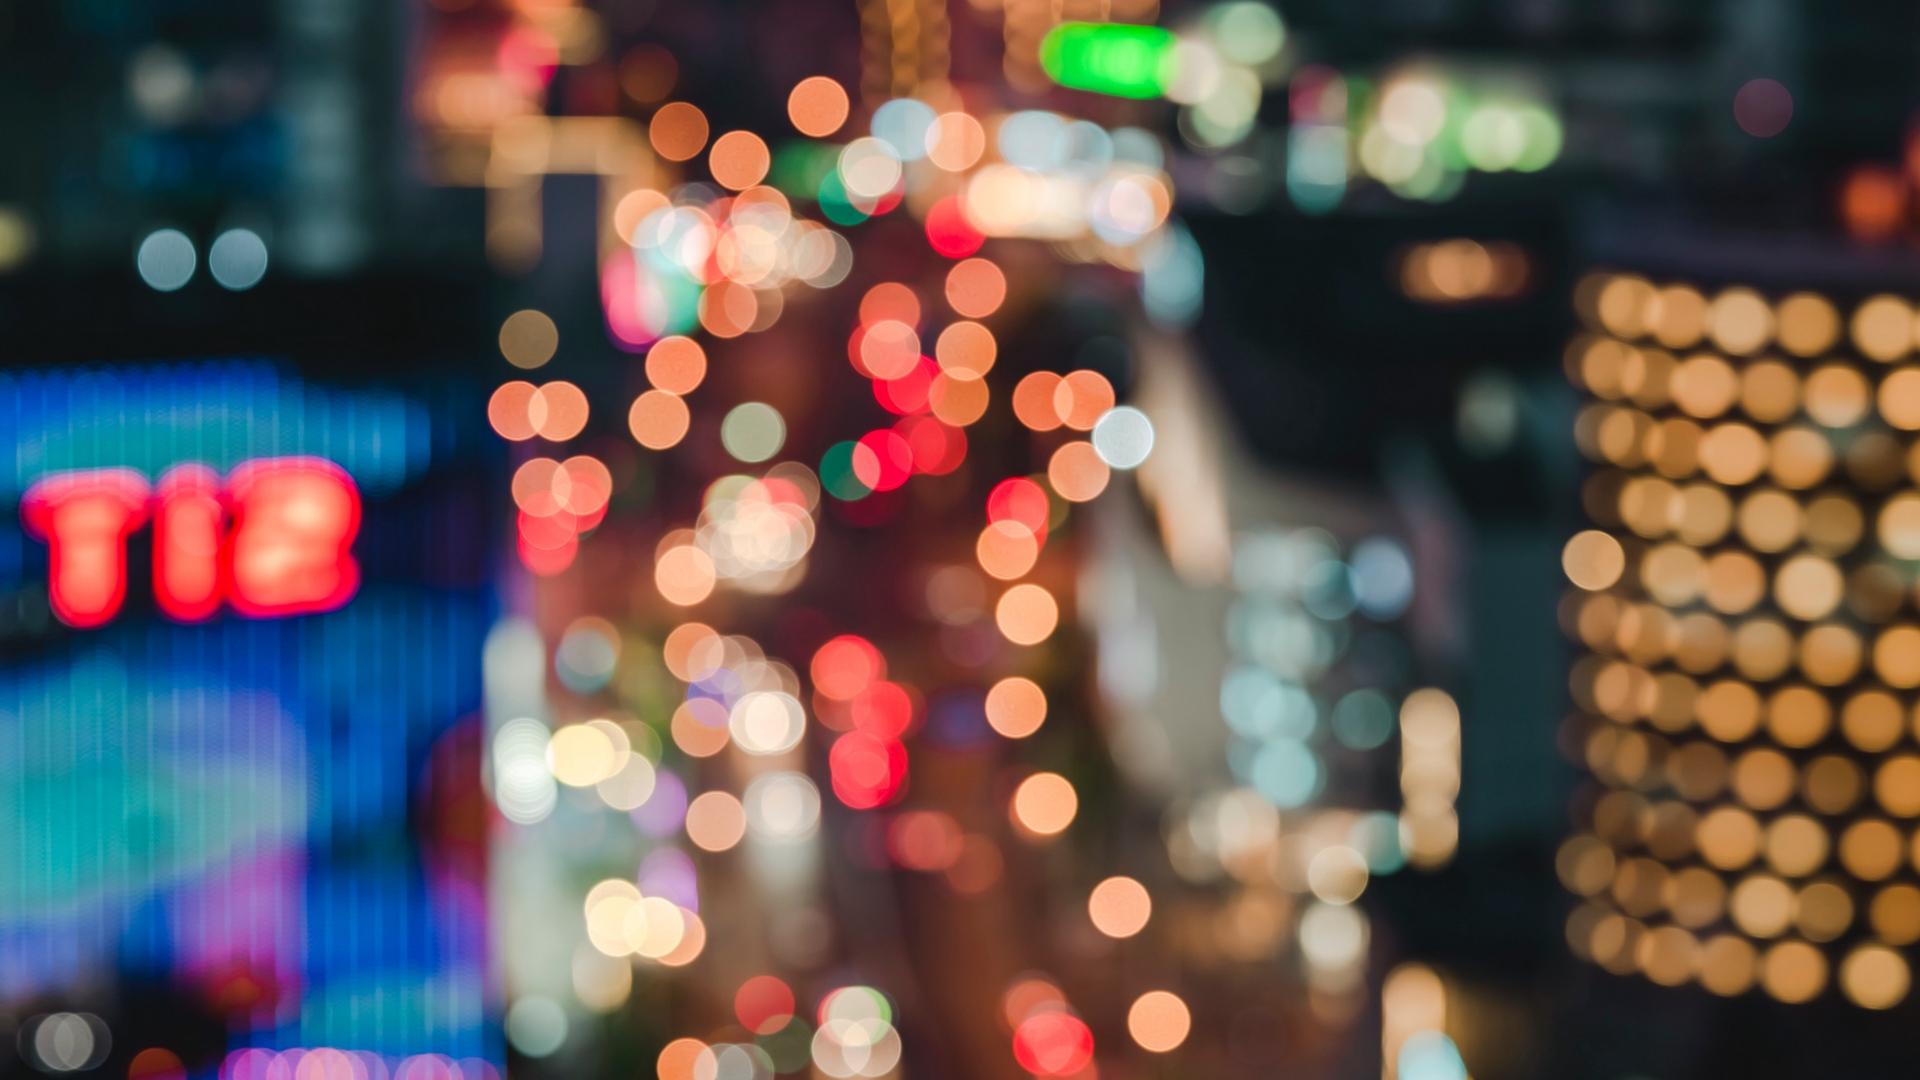 Wallpaper Blur Bokeh Lights Colorful Glare City Blur City Background Hd 1920x1080 Wallpaper Teahub Io Hd wallpaper lights blur city glare